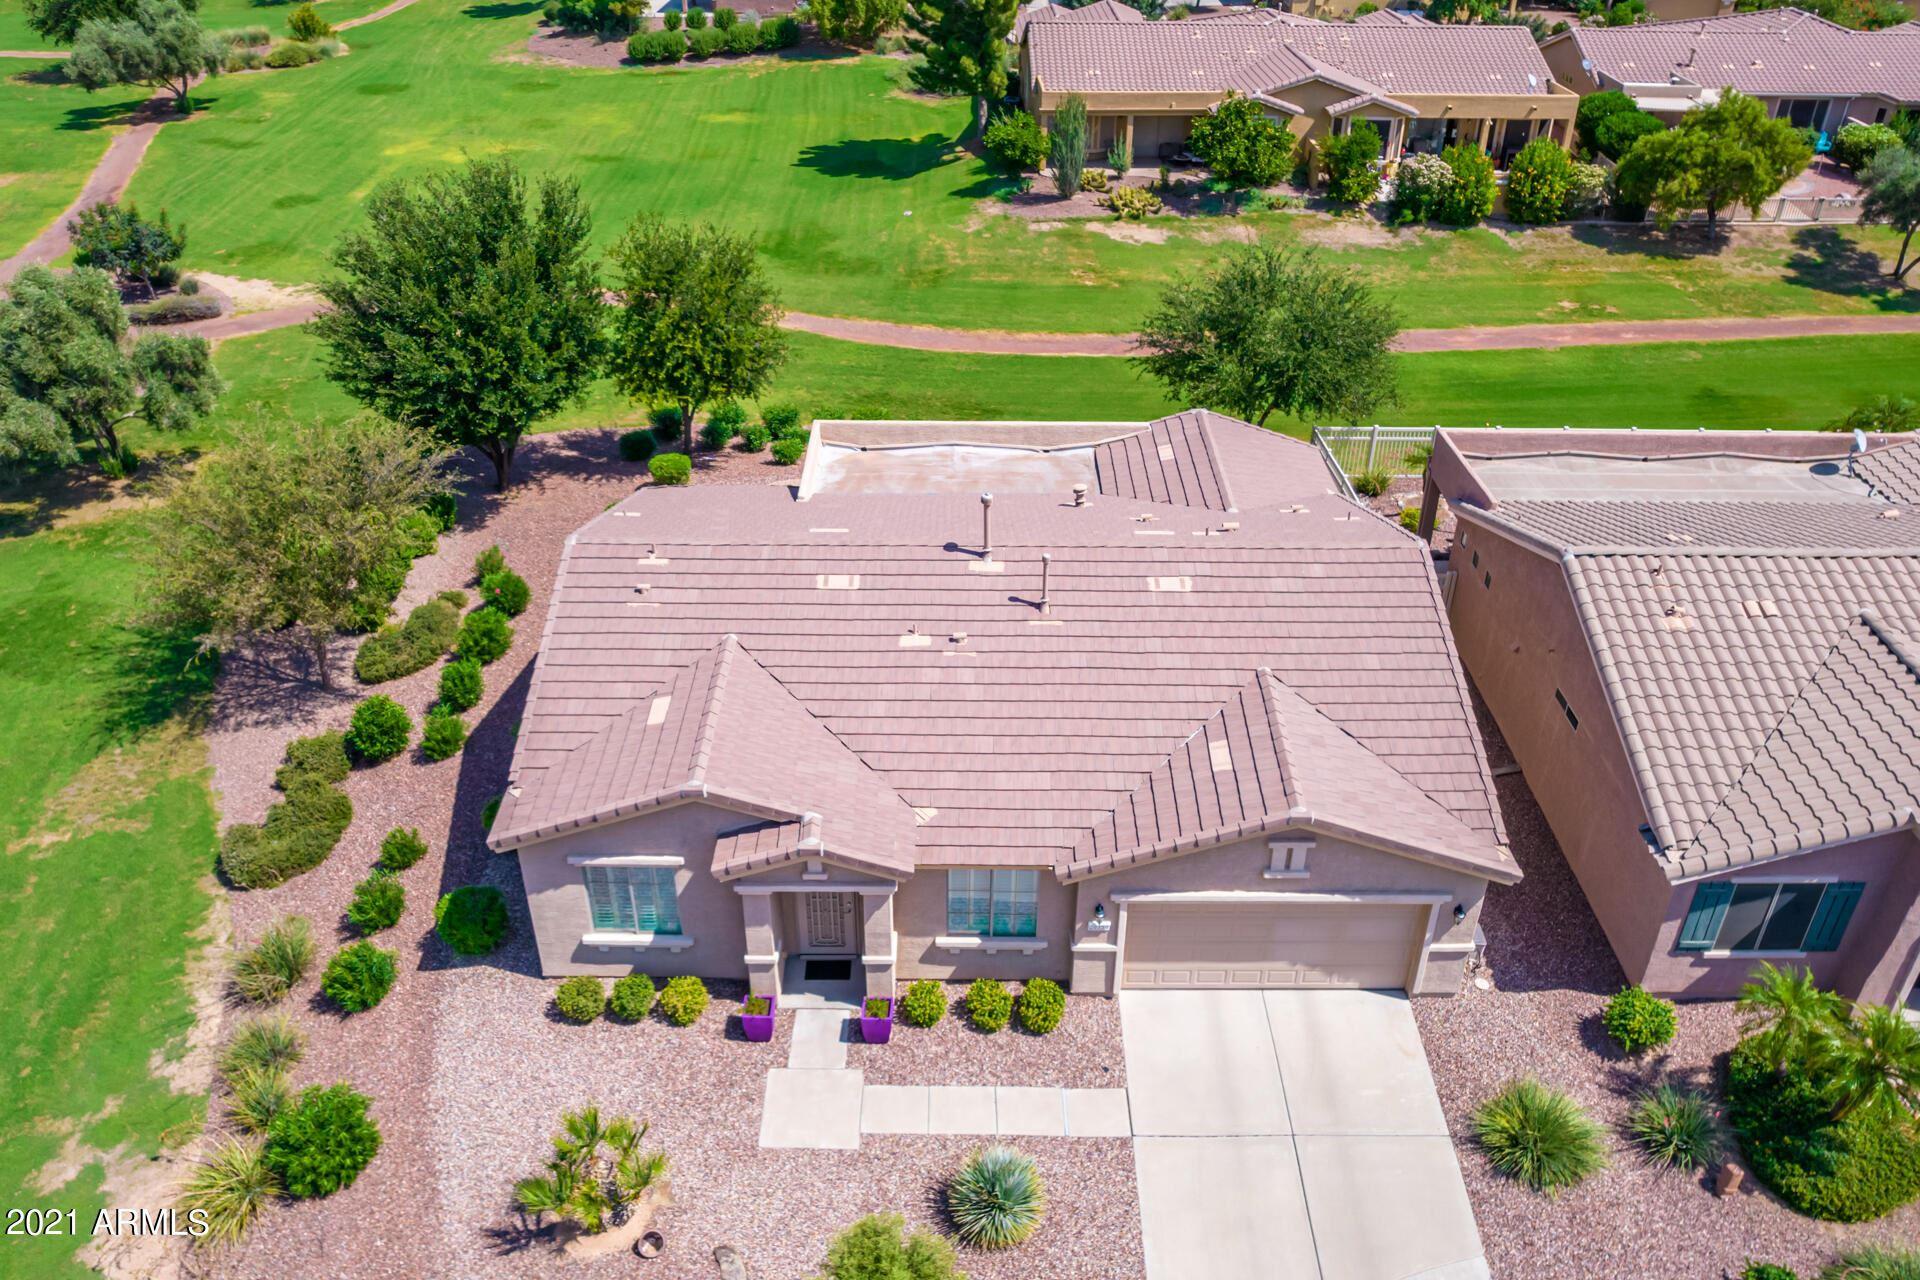 Photo of 20357 N RIVERBANK Road, Maricopa, AZ 85138 (MLS # 6294520)